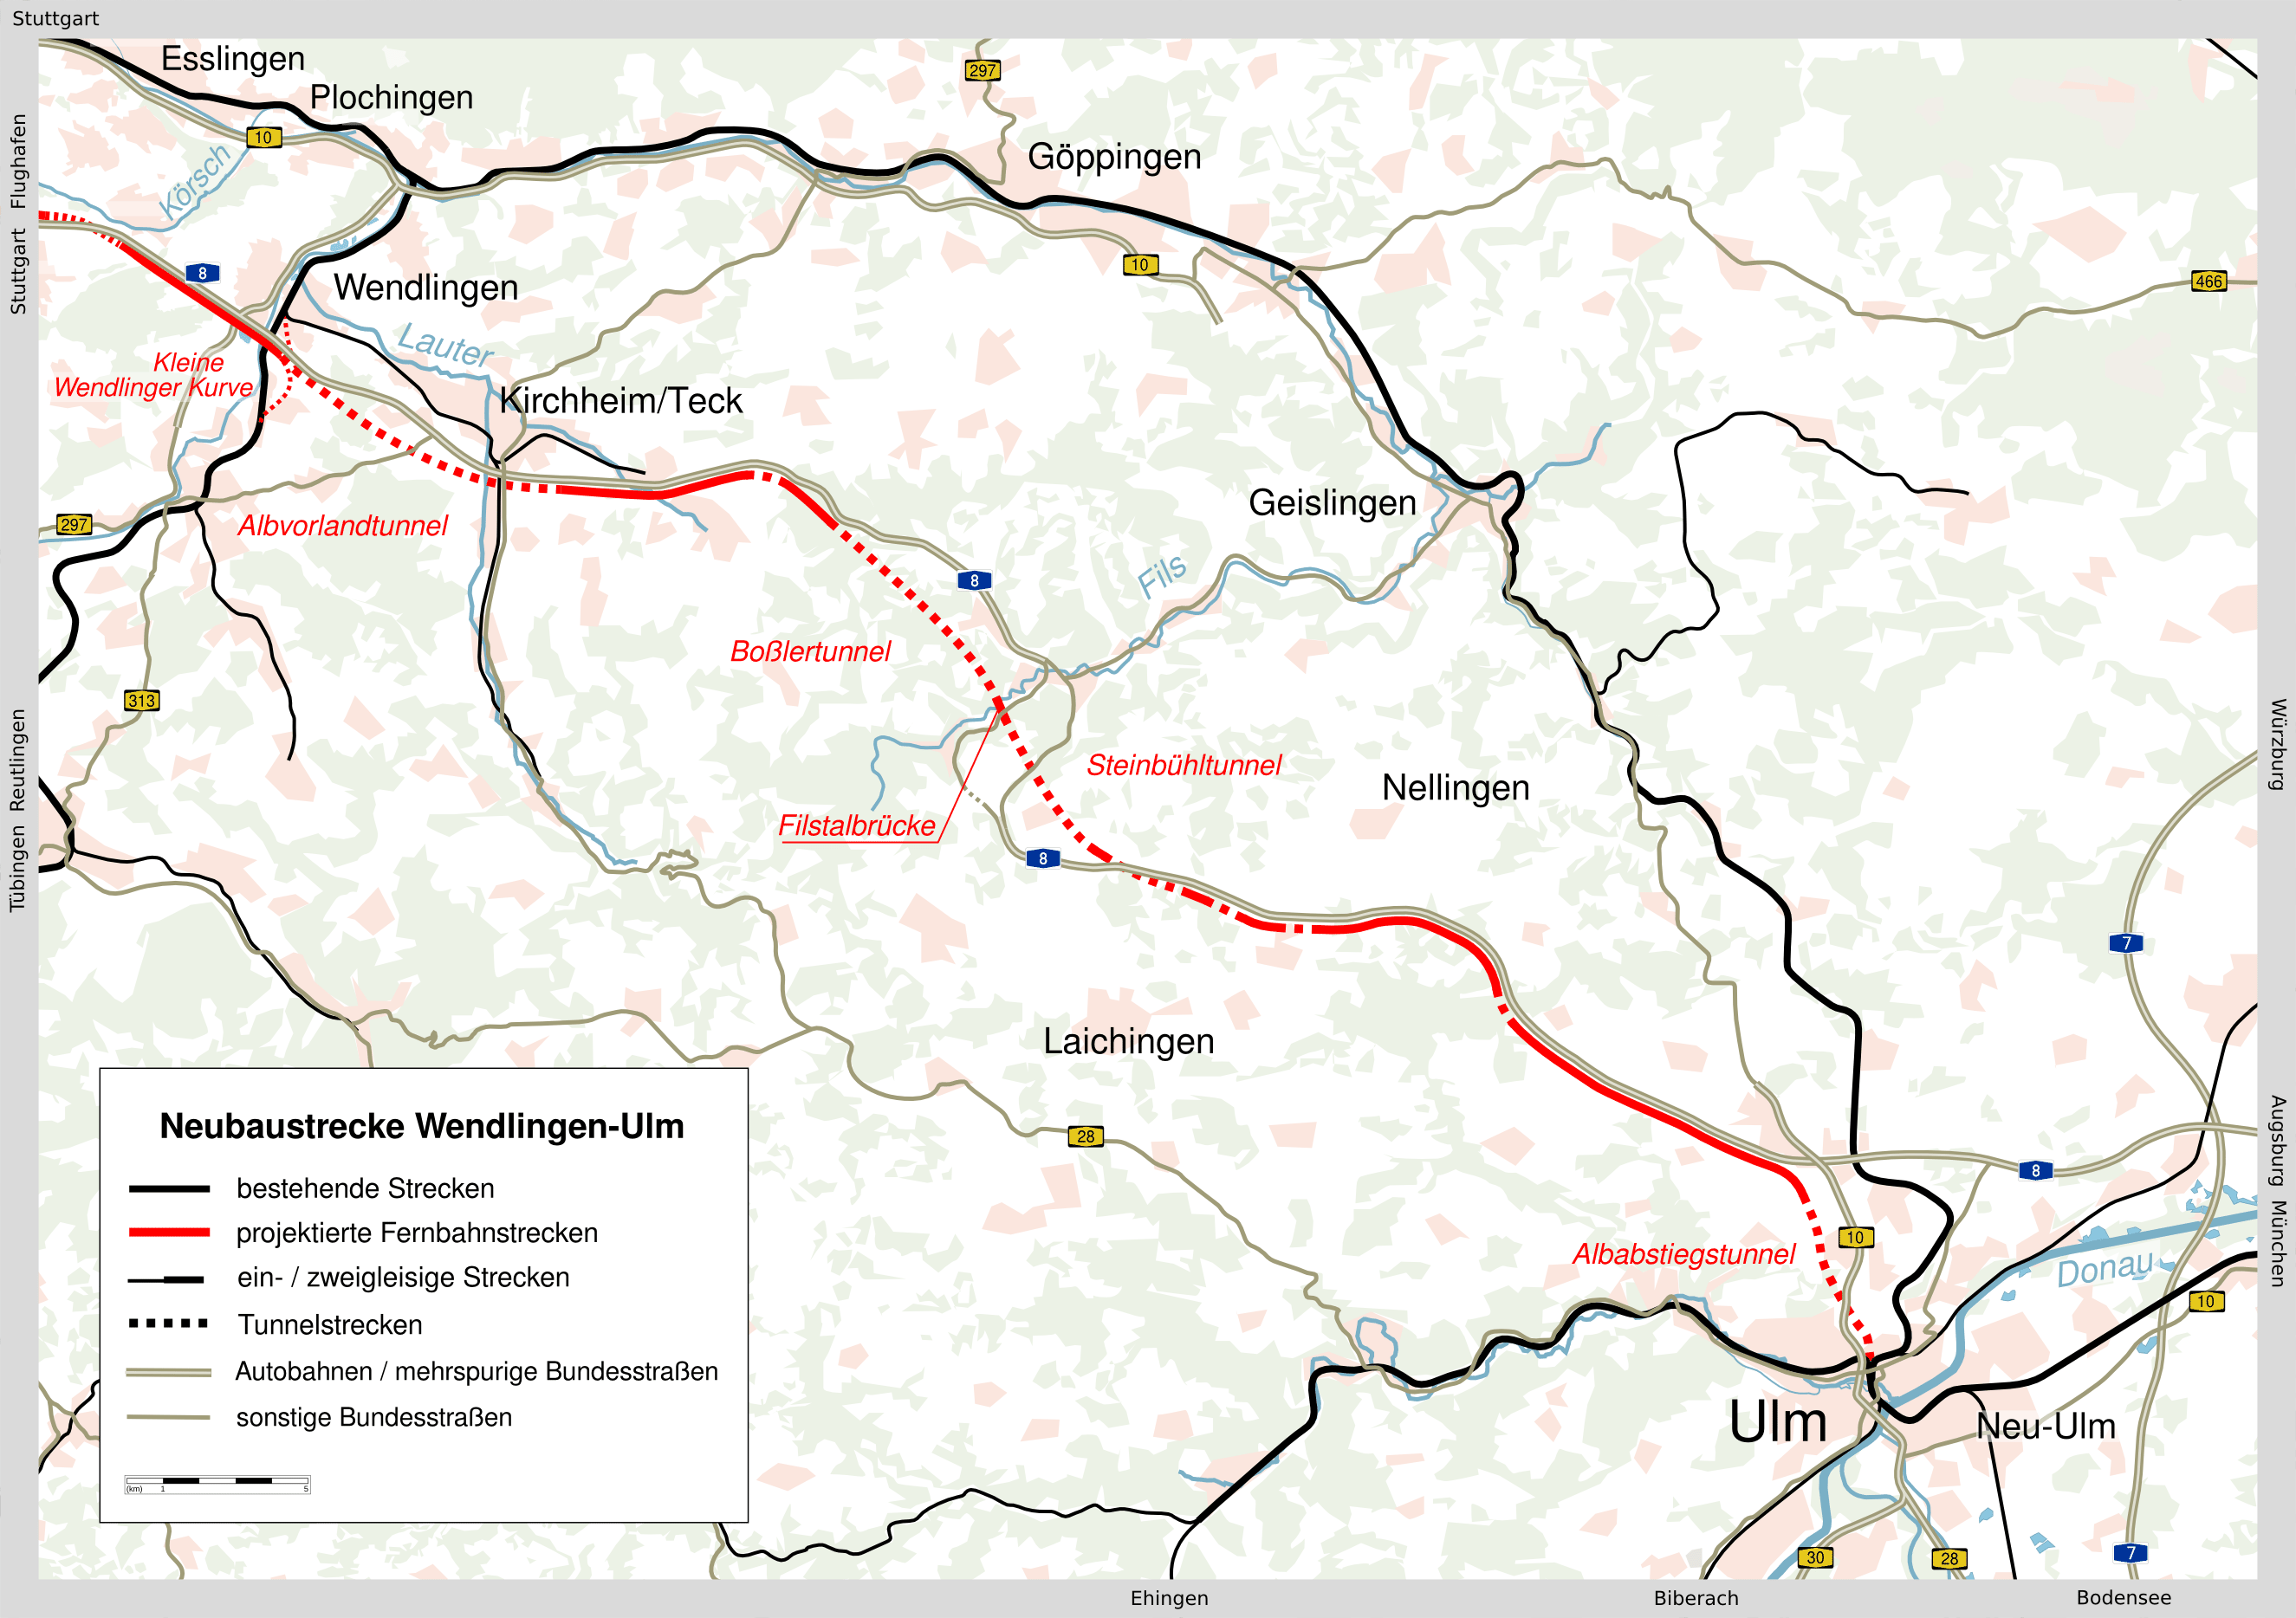 Neubaustrecke Wendlingenulm Wikipedia